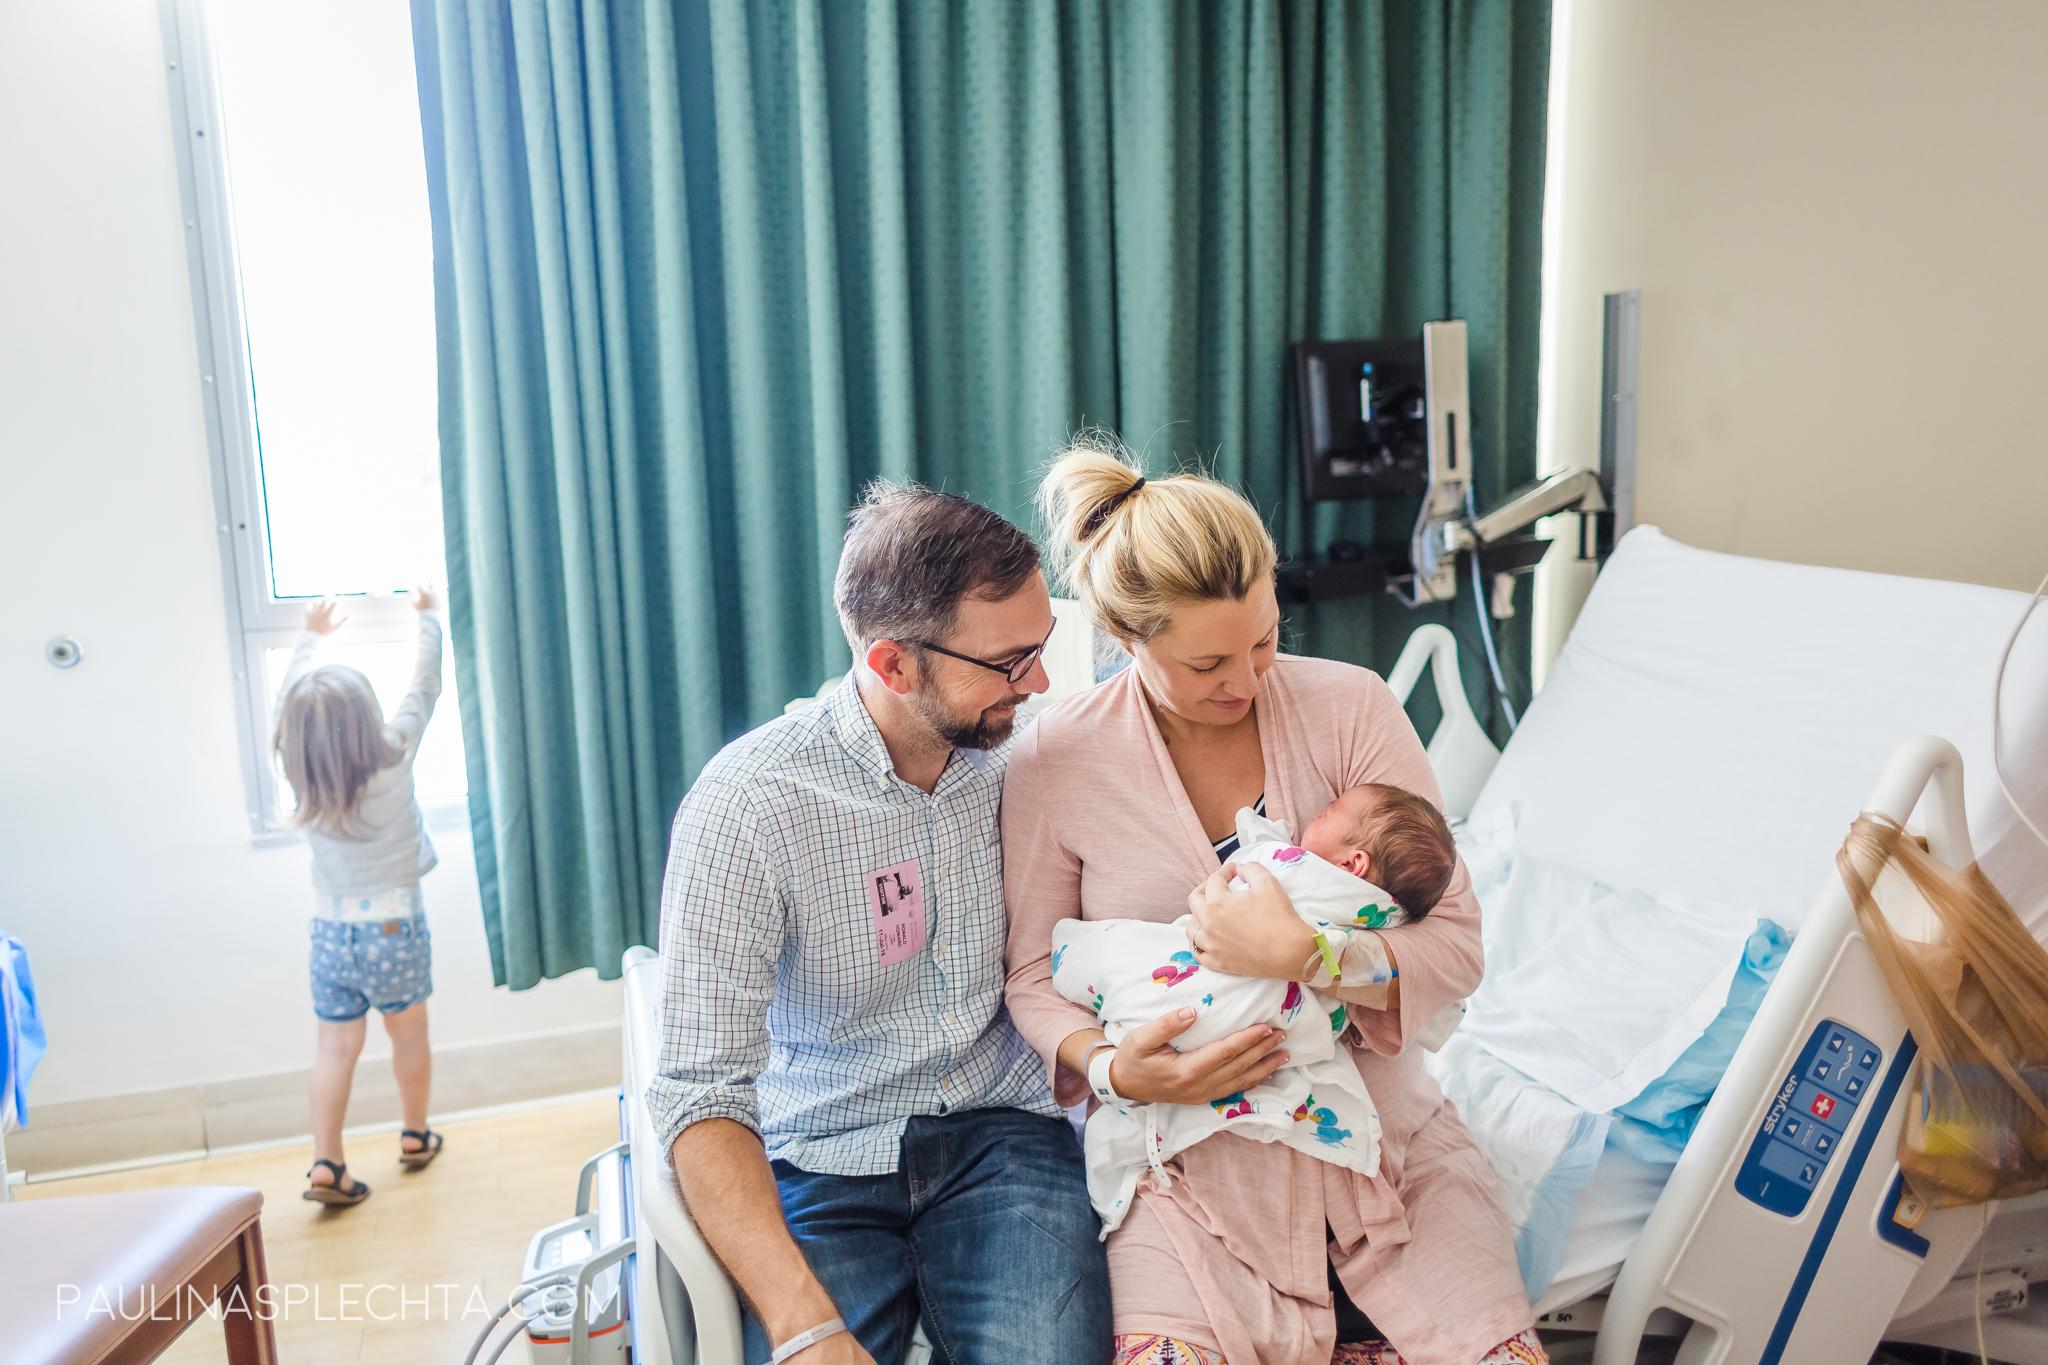 boca-birth-photographer-kathy-fair-courtney-mcmillian-midwife-bocaregional-regional-vaginal-birth-csection-repeat-cesarean-christina-hackshaw-7.jpg